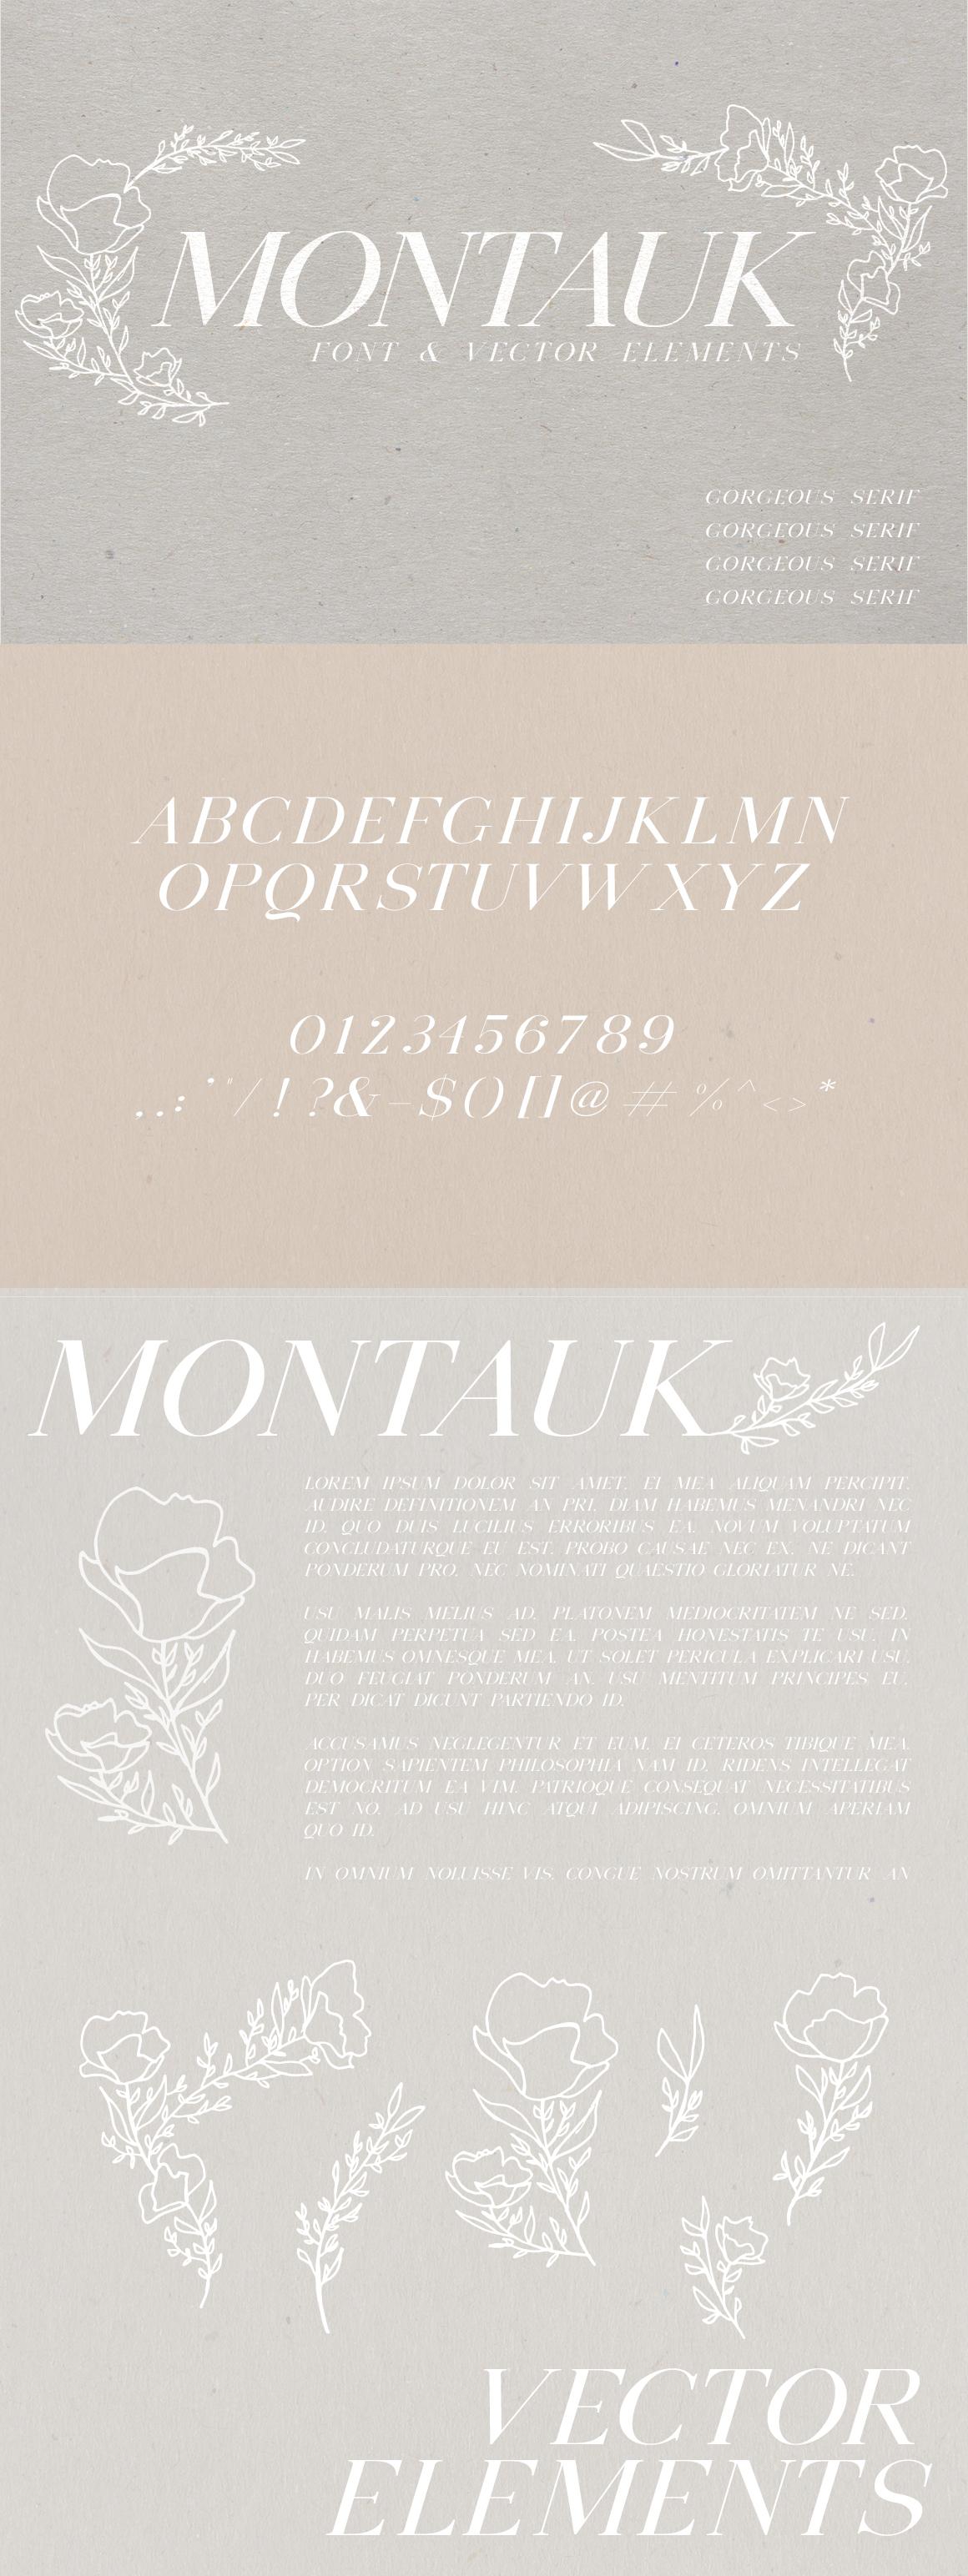 Montauk | Serif + Bonus Vectors example image 5